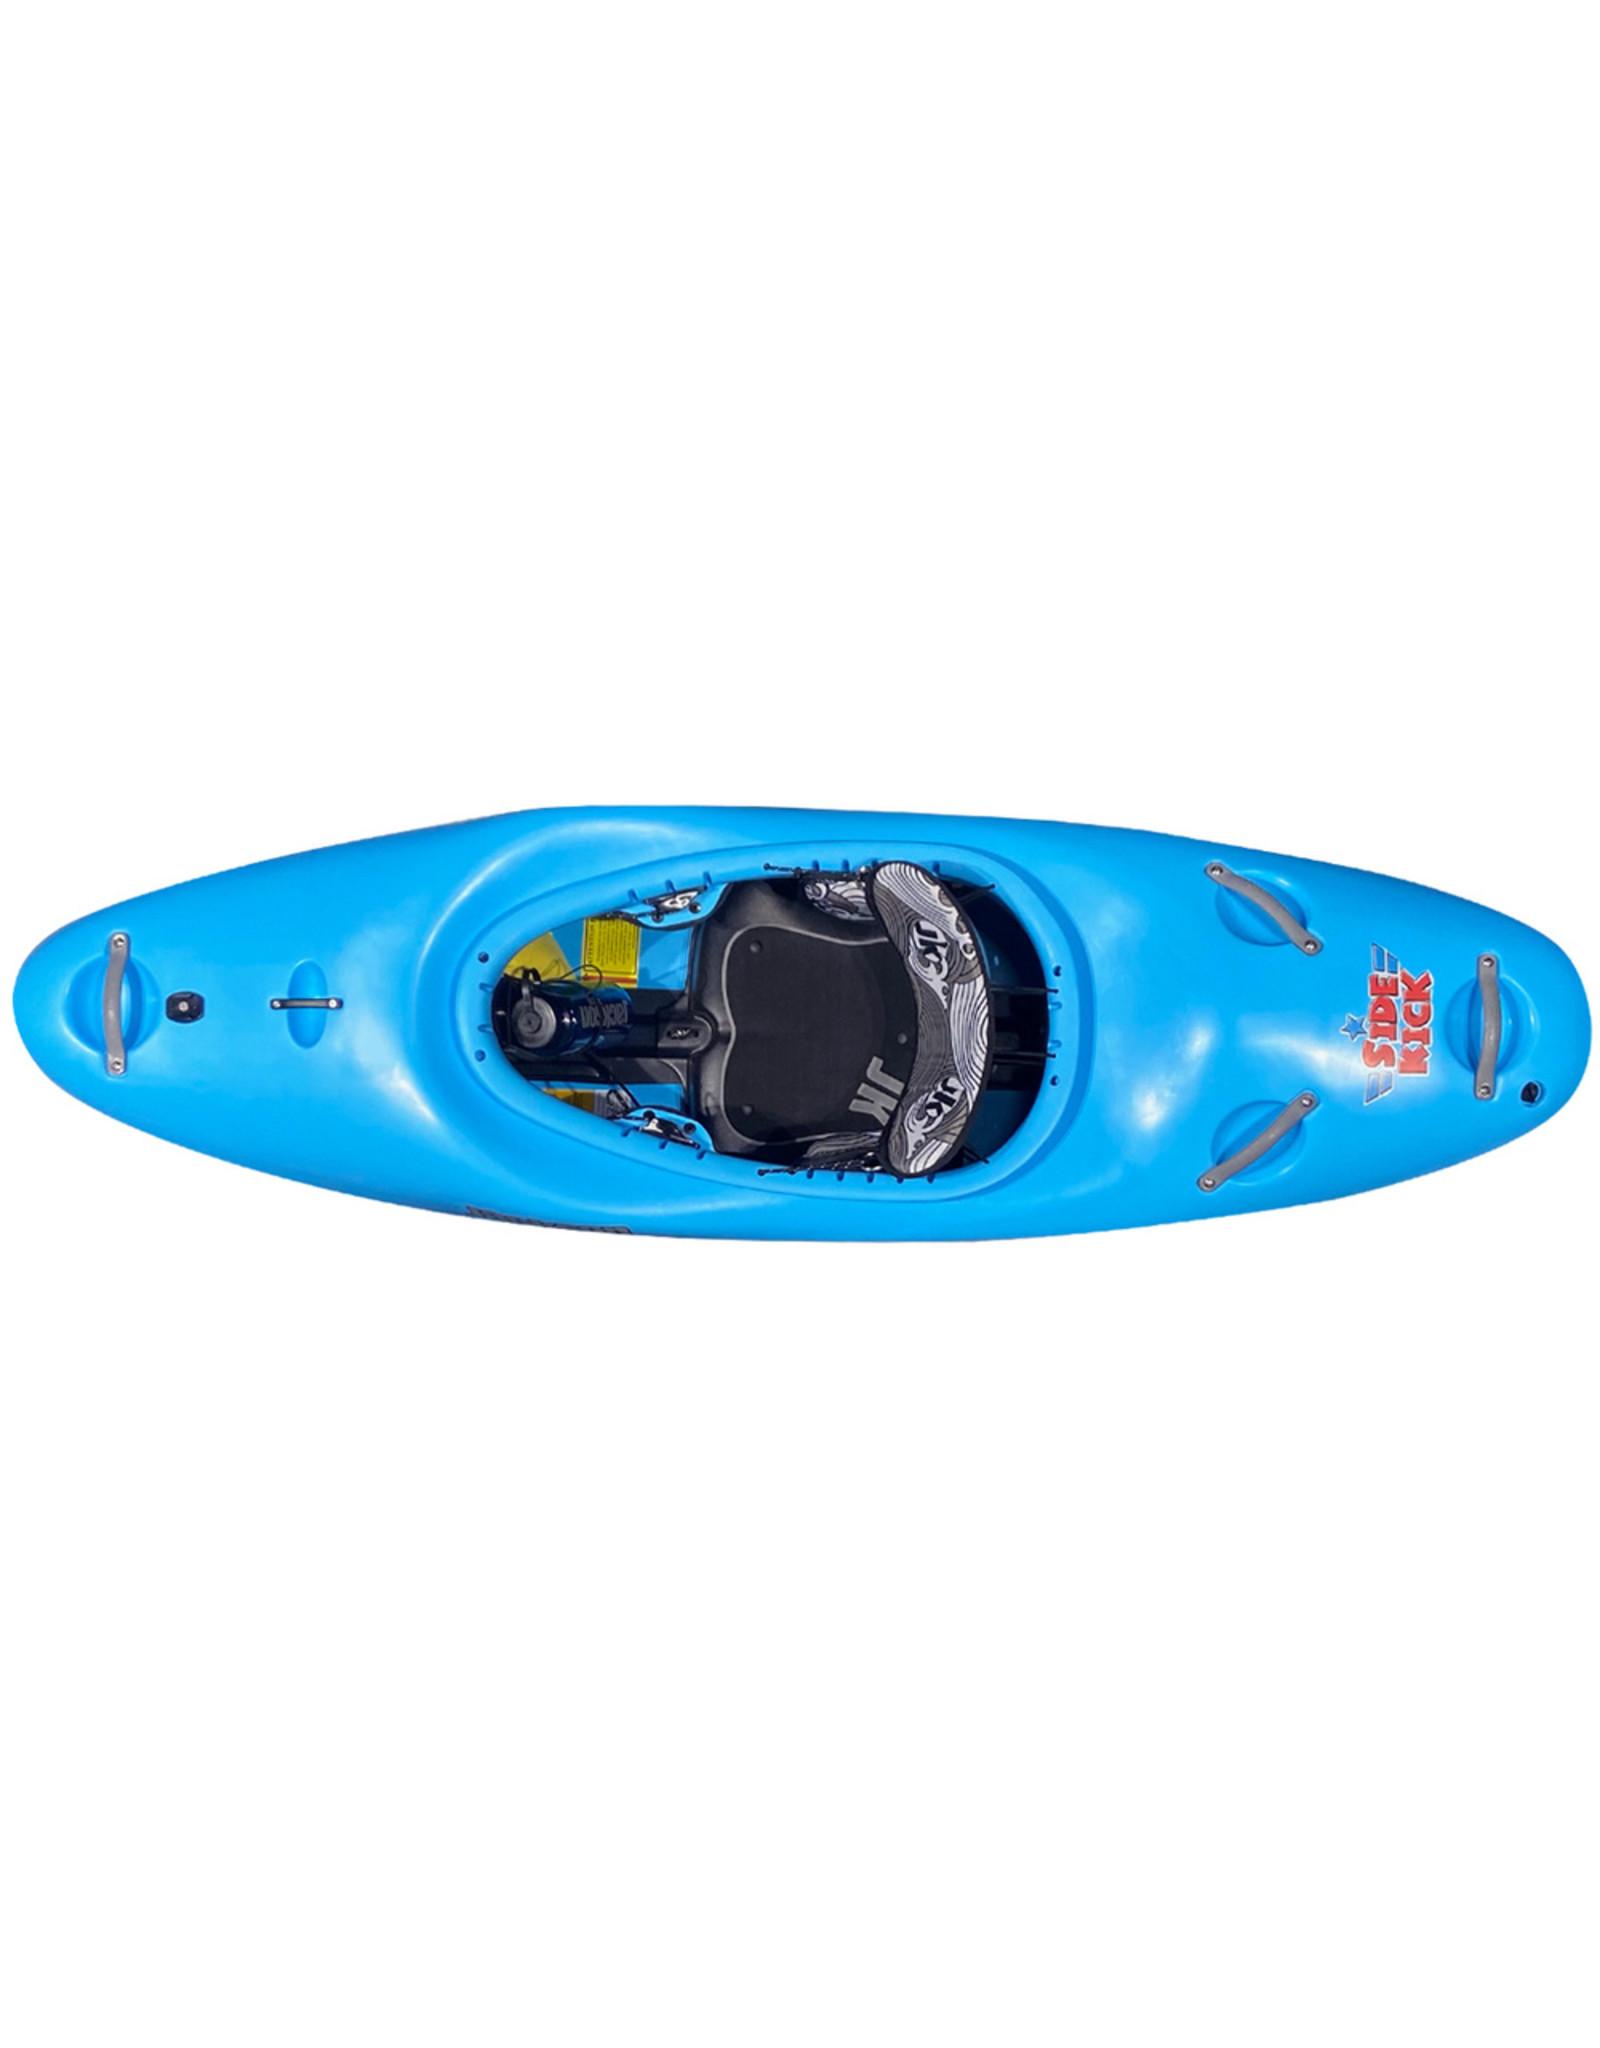 Jackson Kayak Jackson Sidekick